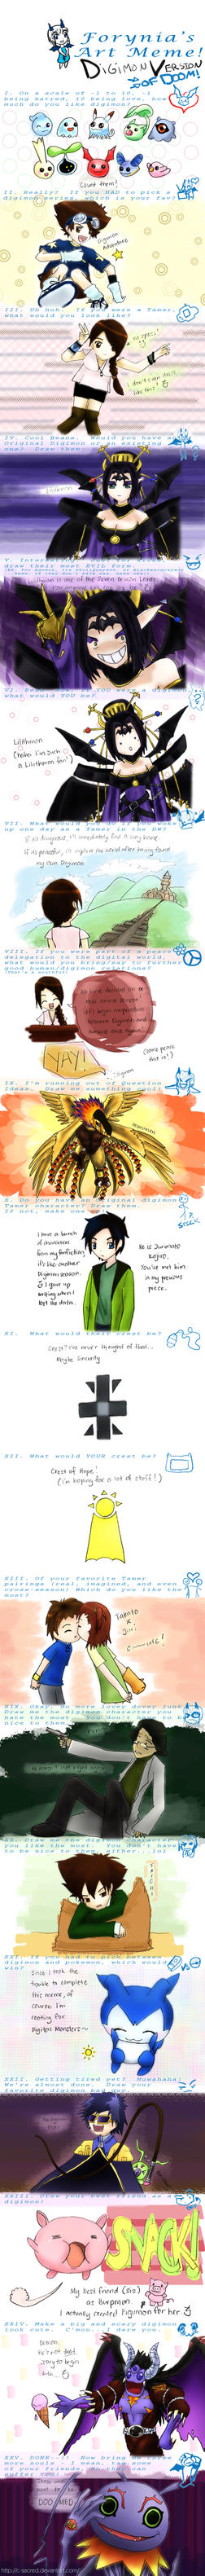 Digimon Meme of DOOM by c-sacred